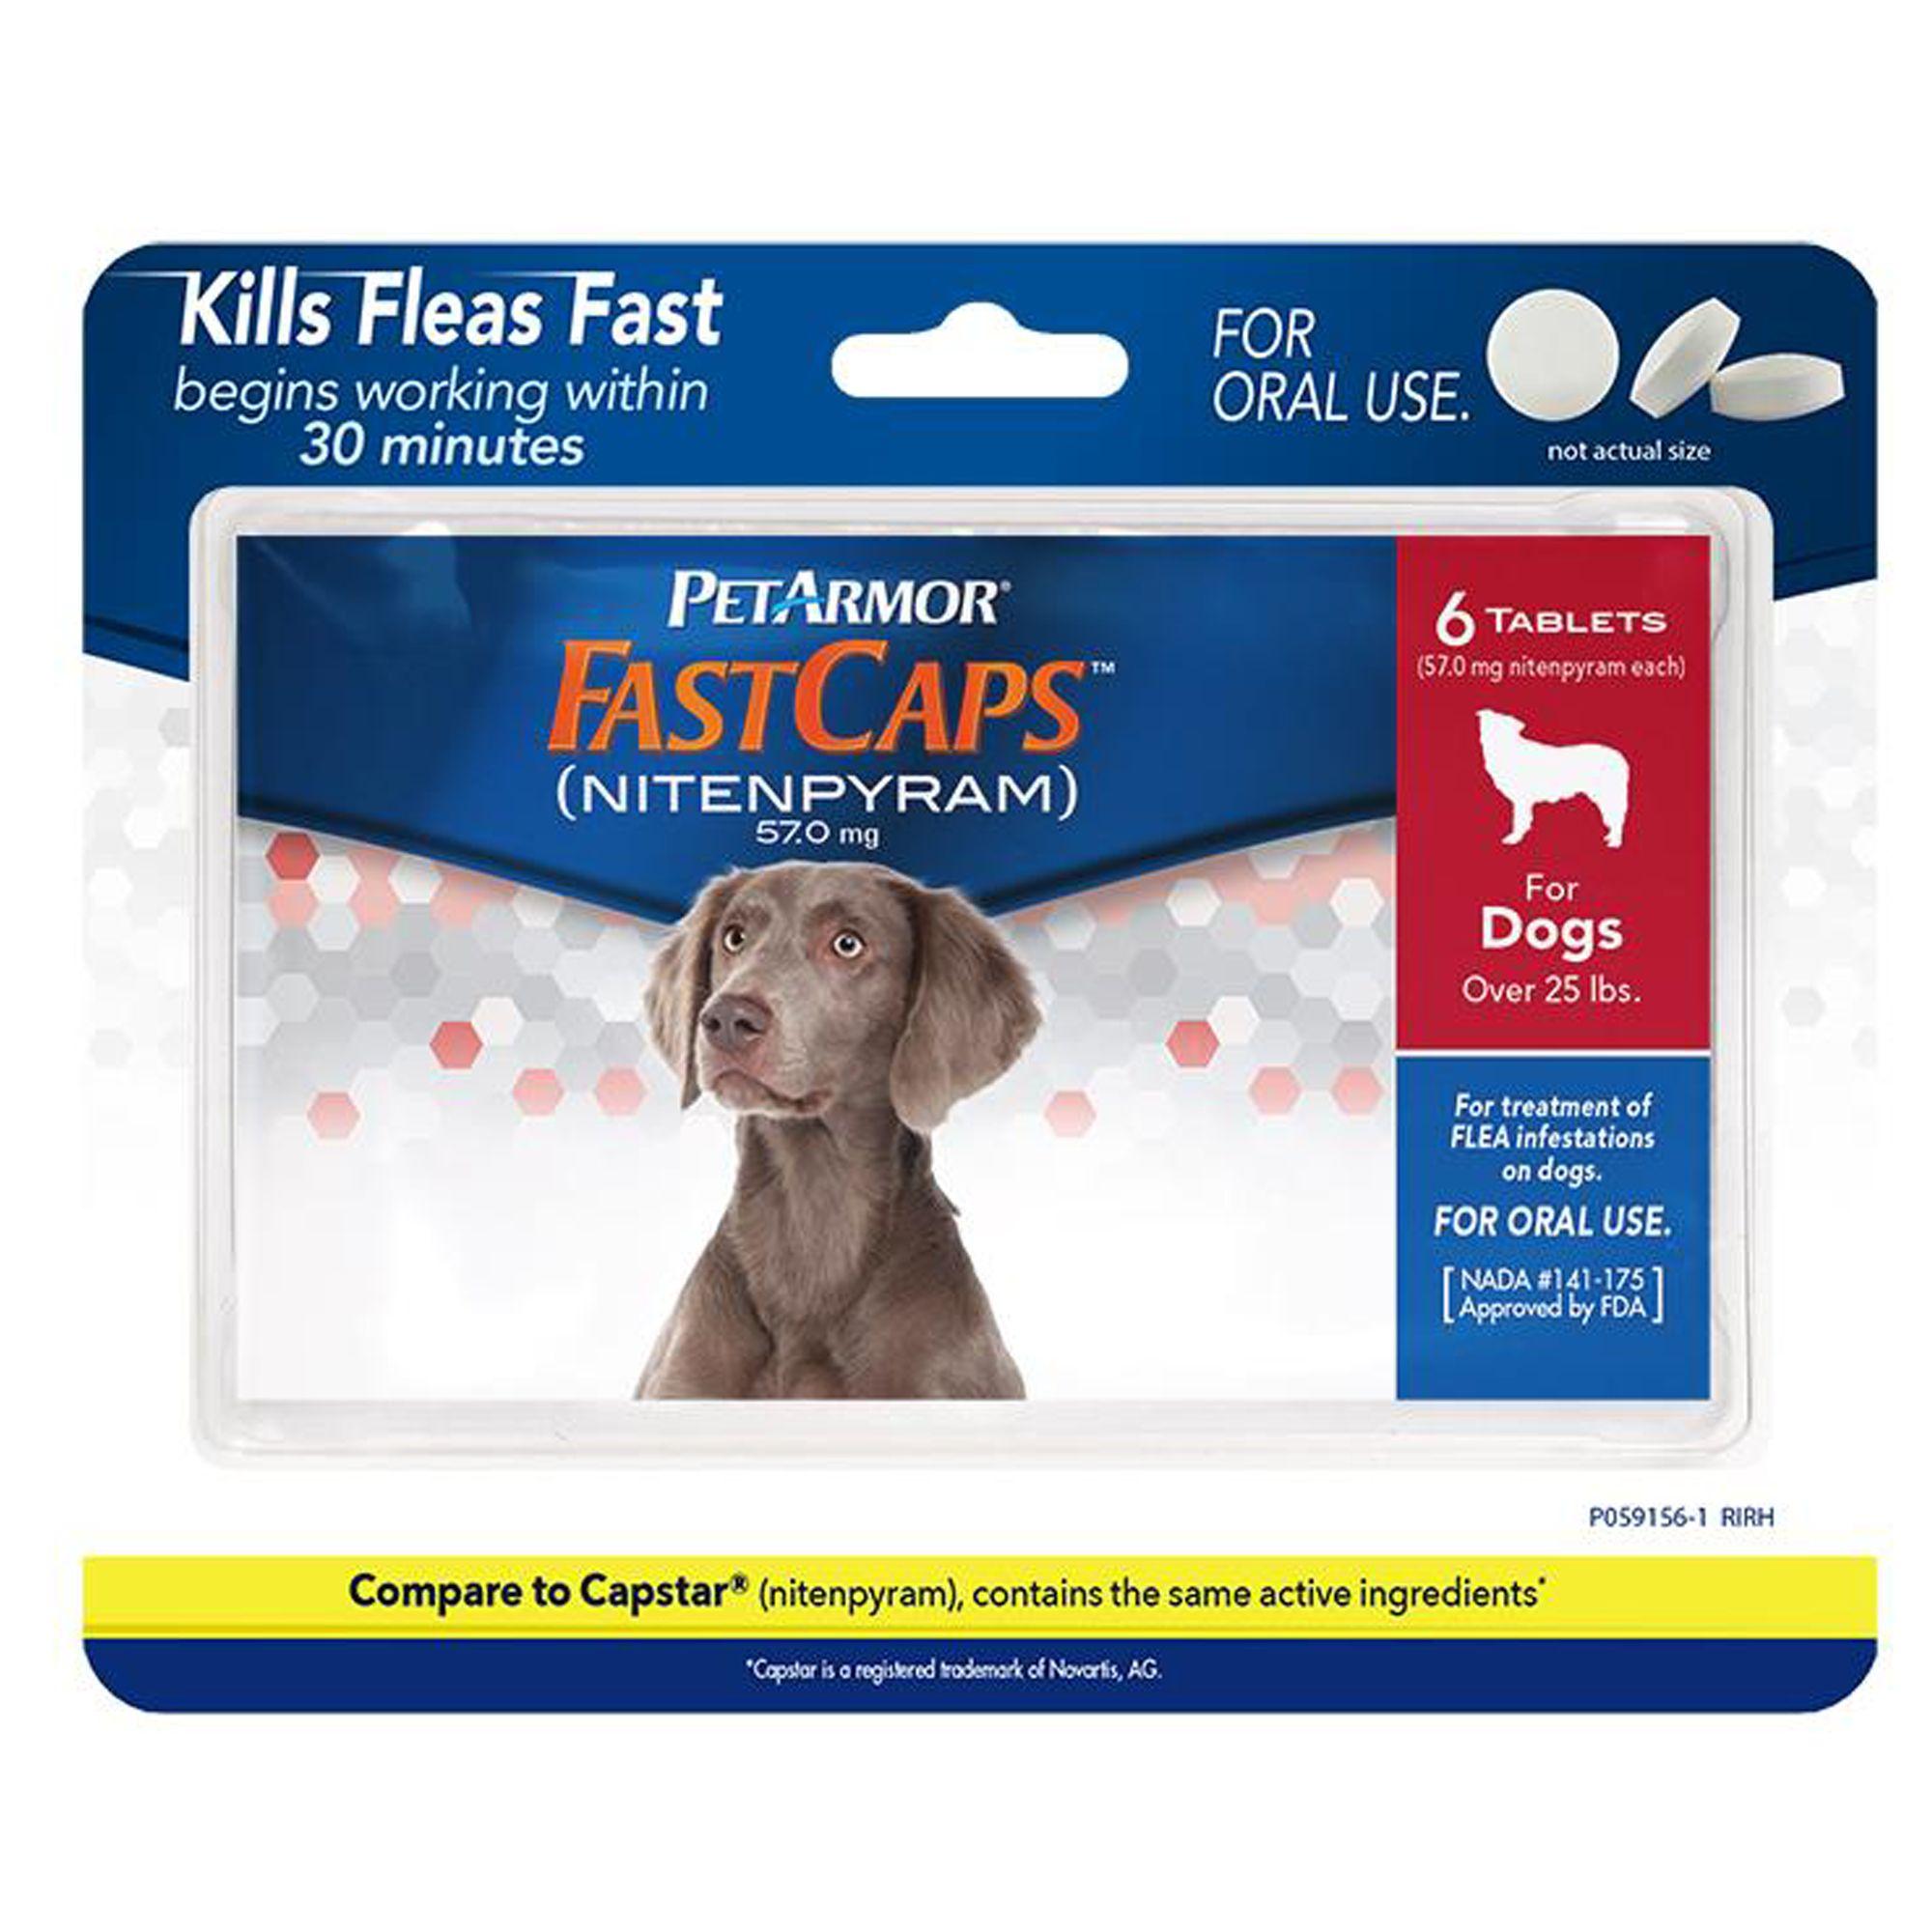 Petarmor Fast Caps 2 25lbs Dog And Cat Flea And Tick Treatment